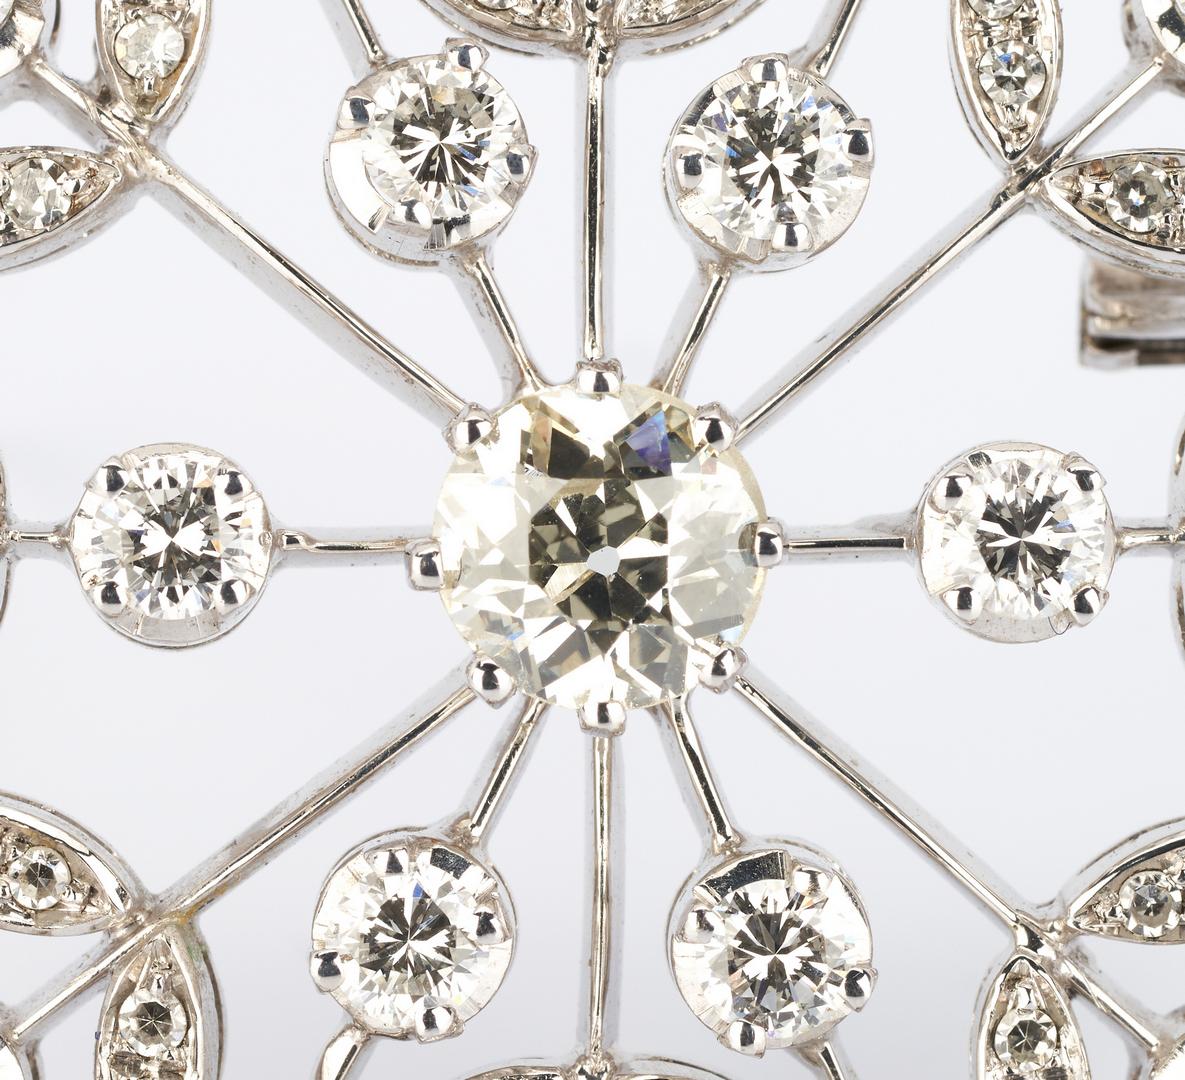 Lot 31: Ladies 18k WG Brooch, Mine Cut Diamond